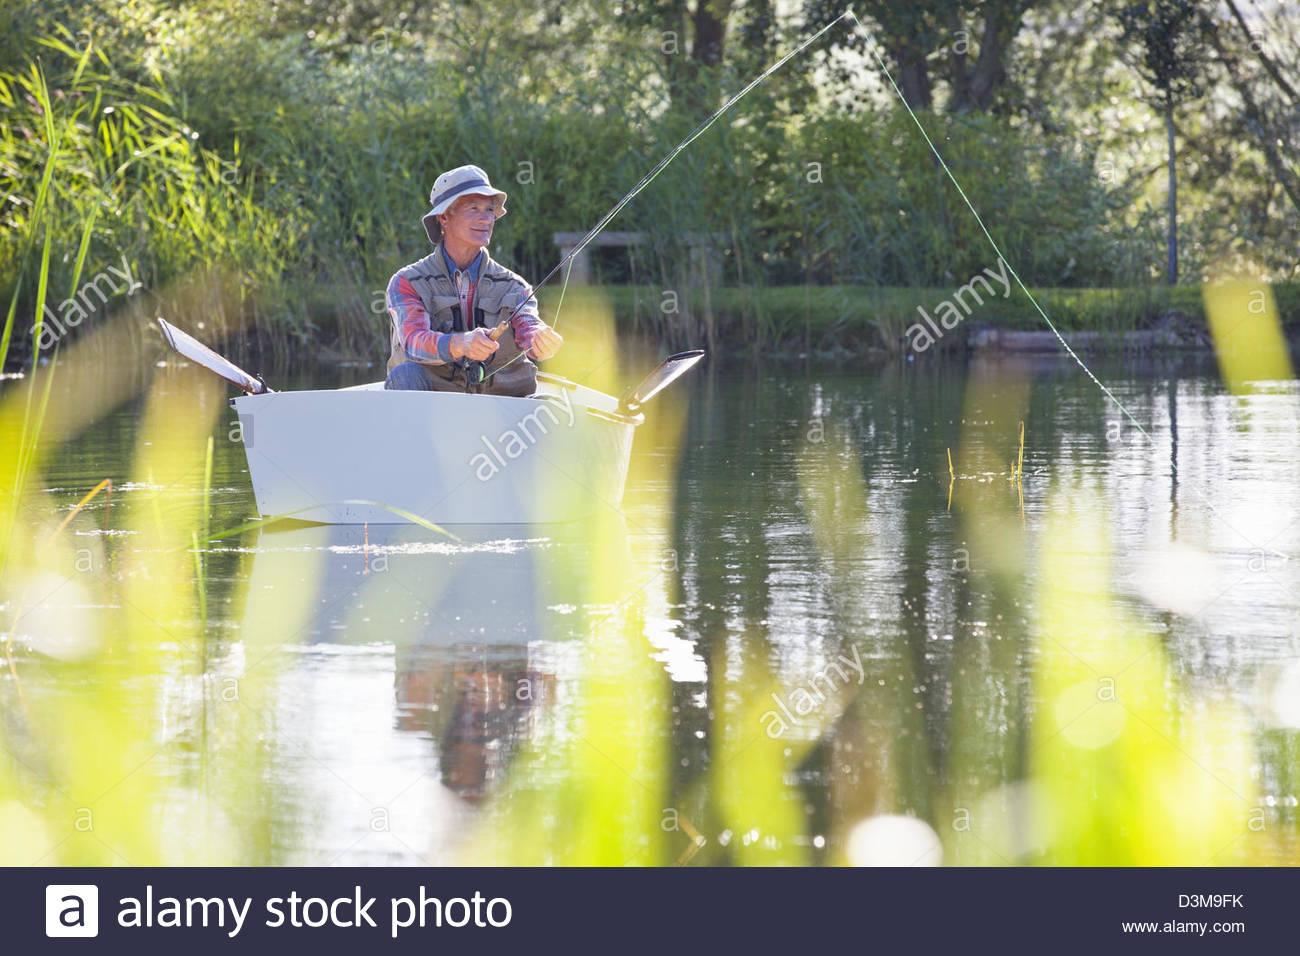 Man fishing from rowboat on lake - Stock Image